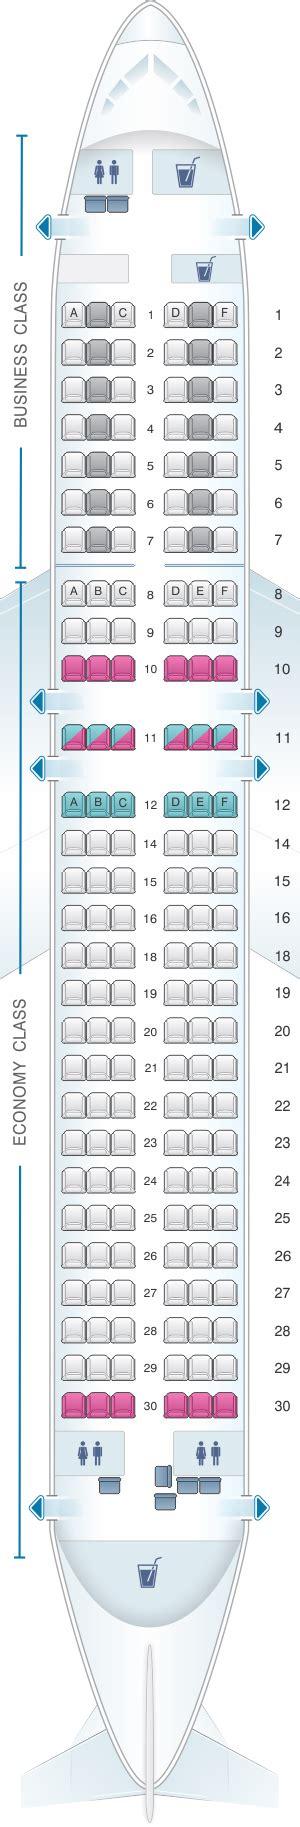 plan des sieges airbus a320 plan de cabine lufthansa airbus a320 seatmaestro fr